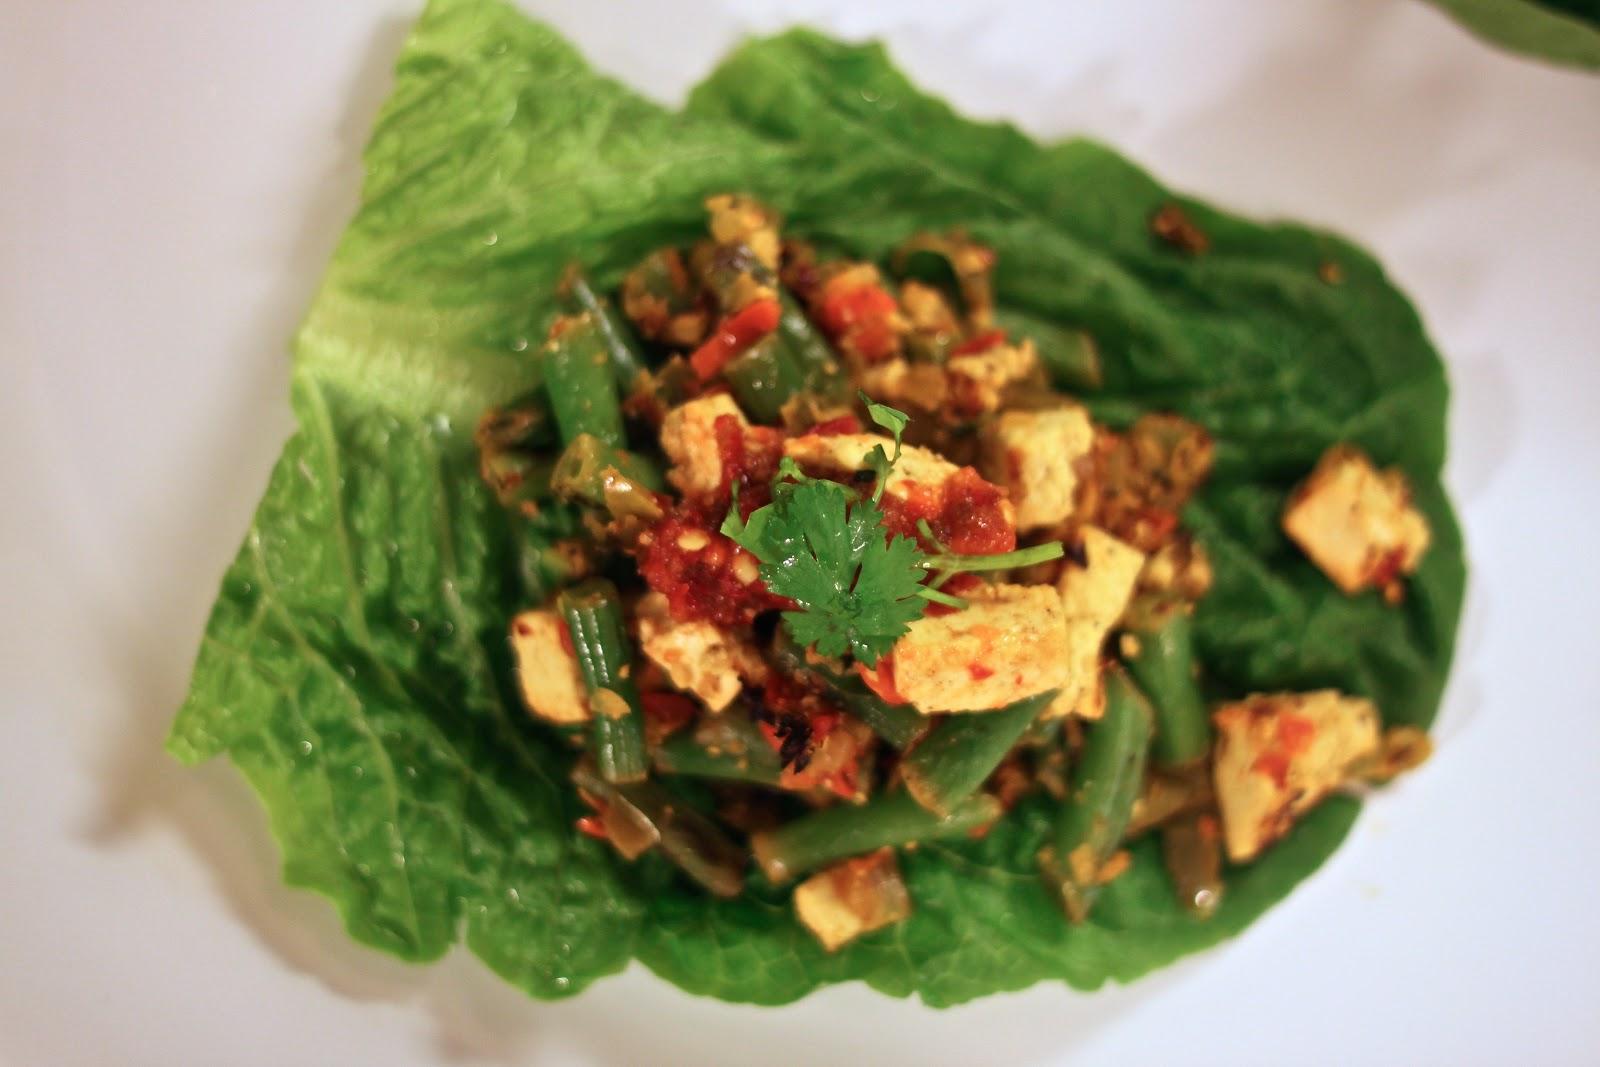 Jenessa's Dinners: Spicy Tofu Lettuce Wraps